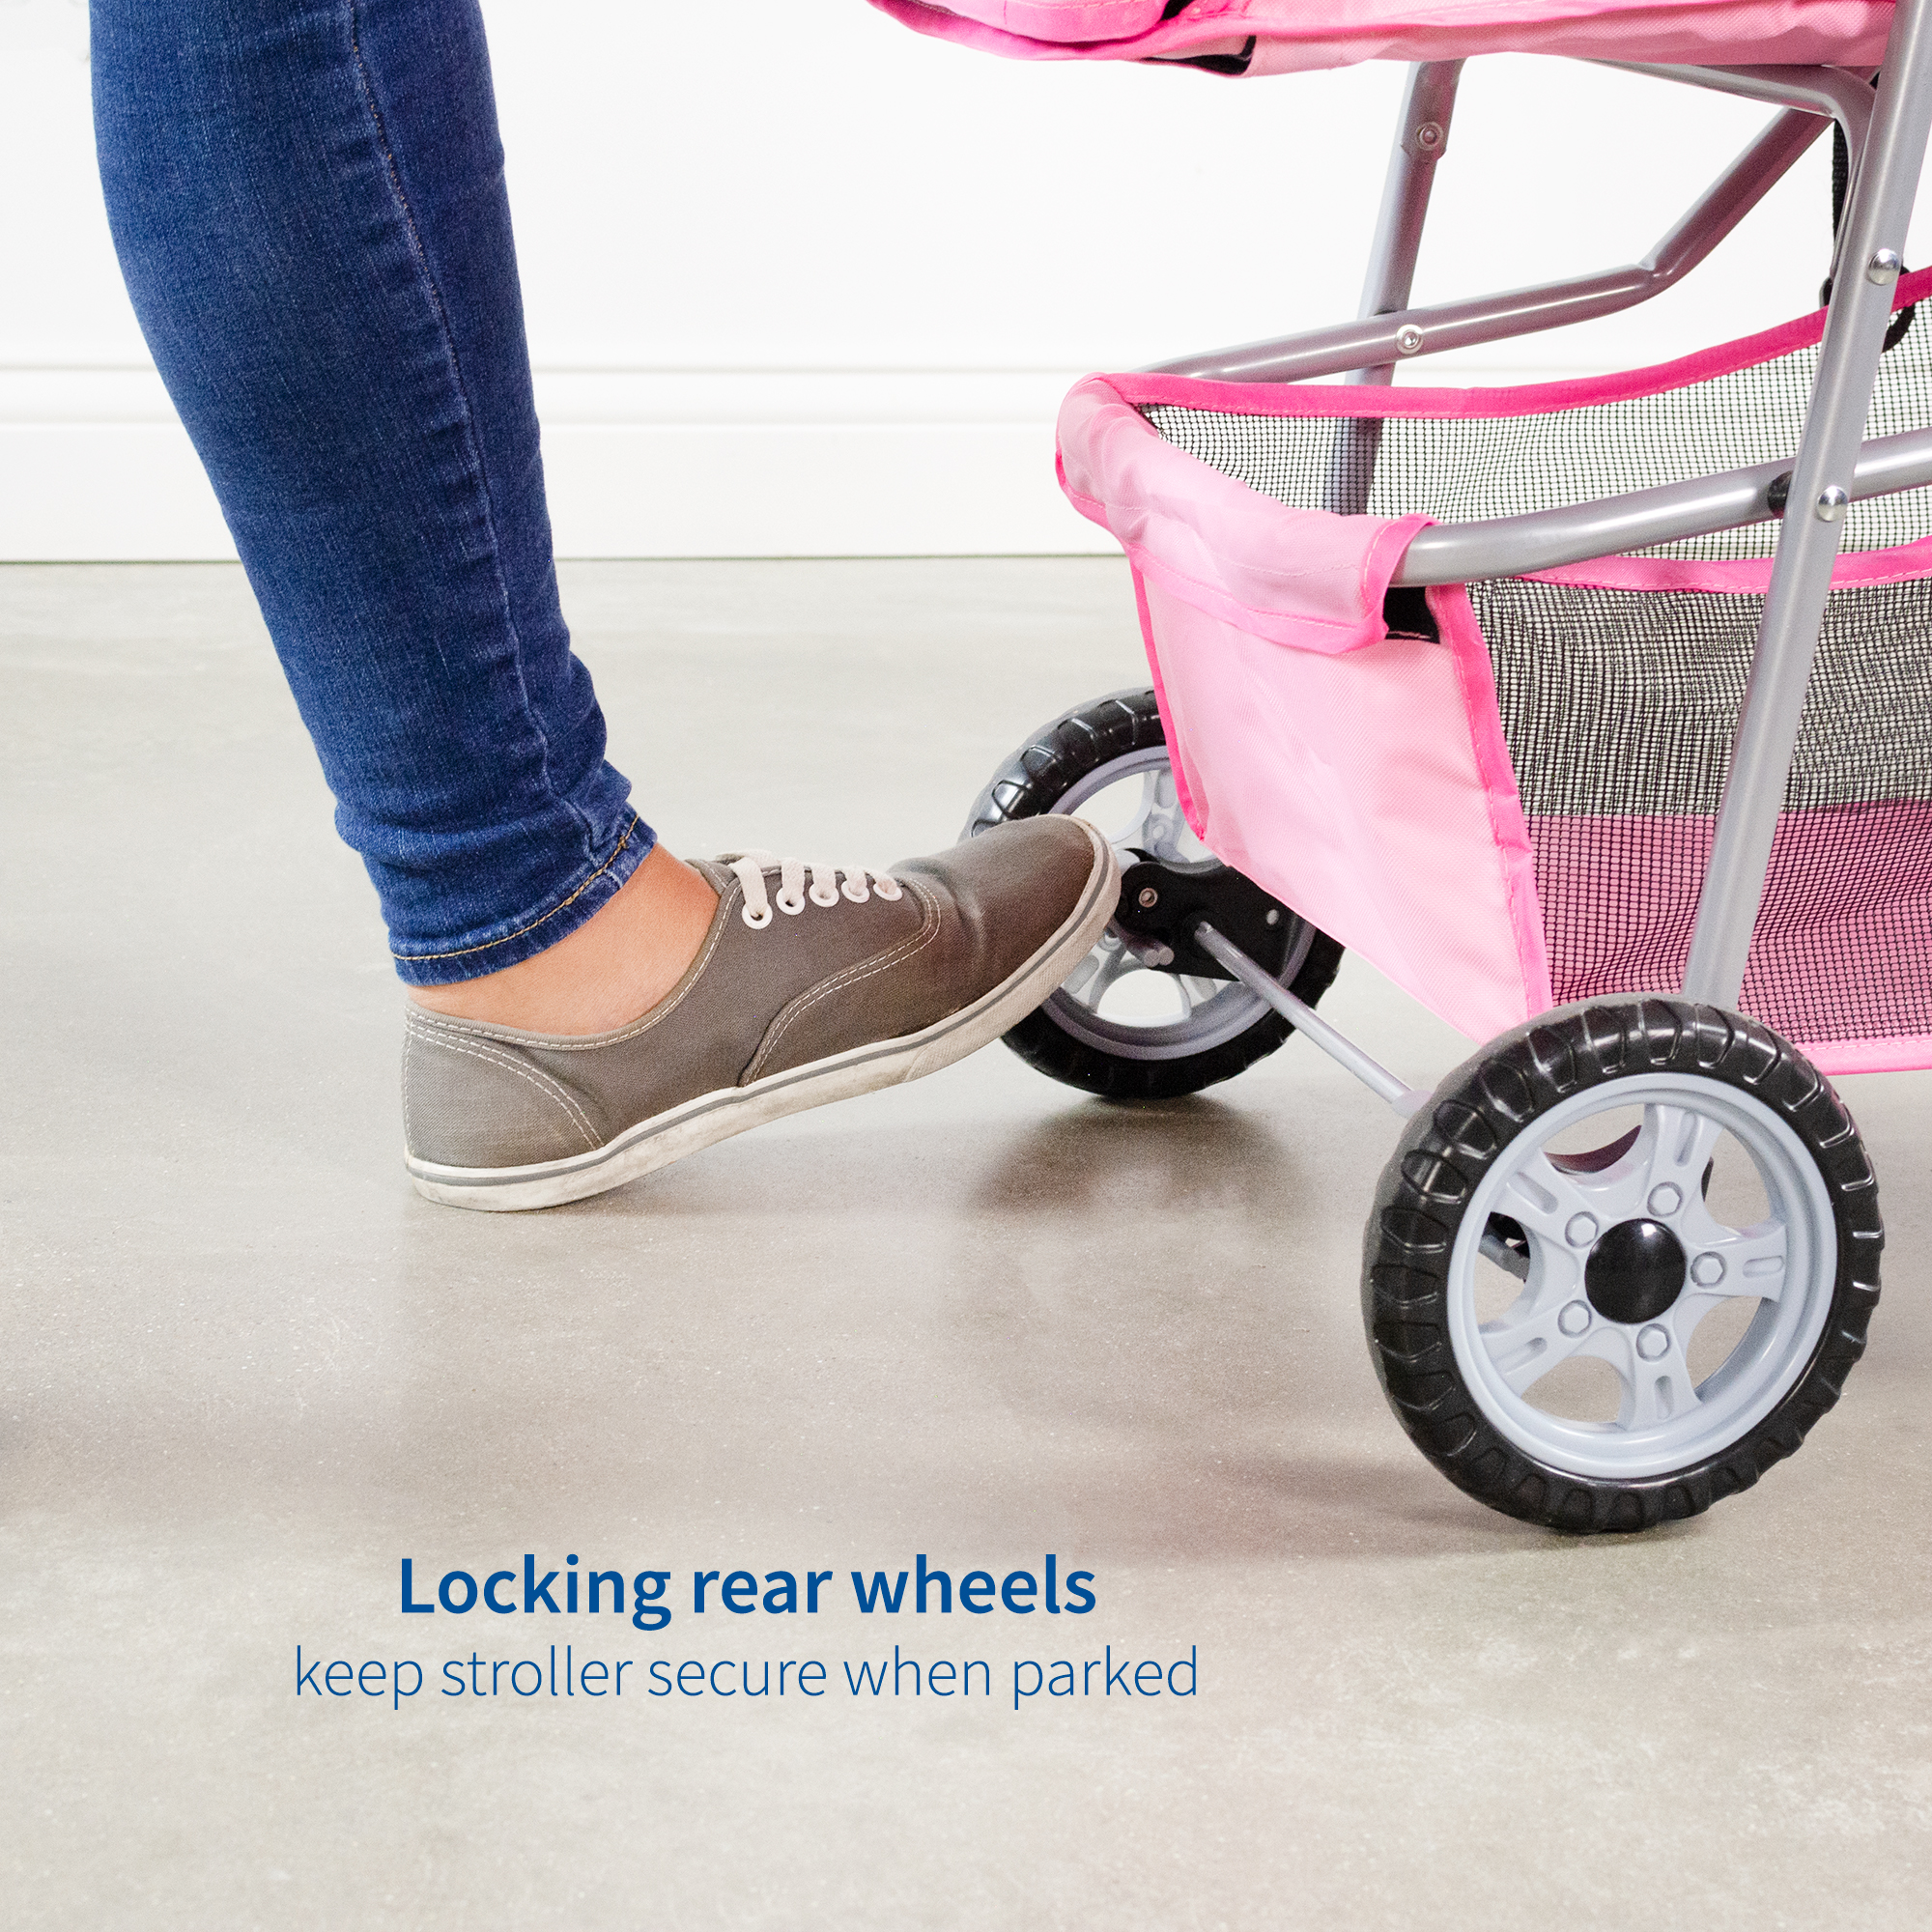 thumbnail 21 - VIVO Three Wheel Pet Stroller / Cat & Dog Foldable Carrier Strolling Cart